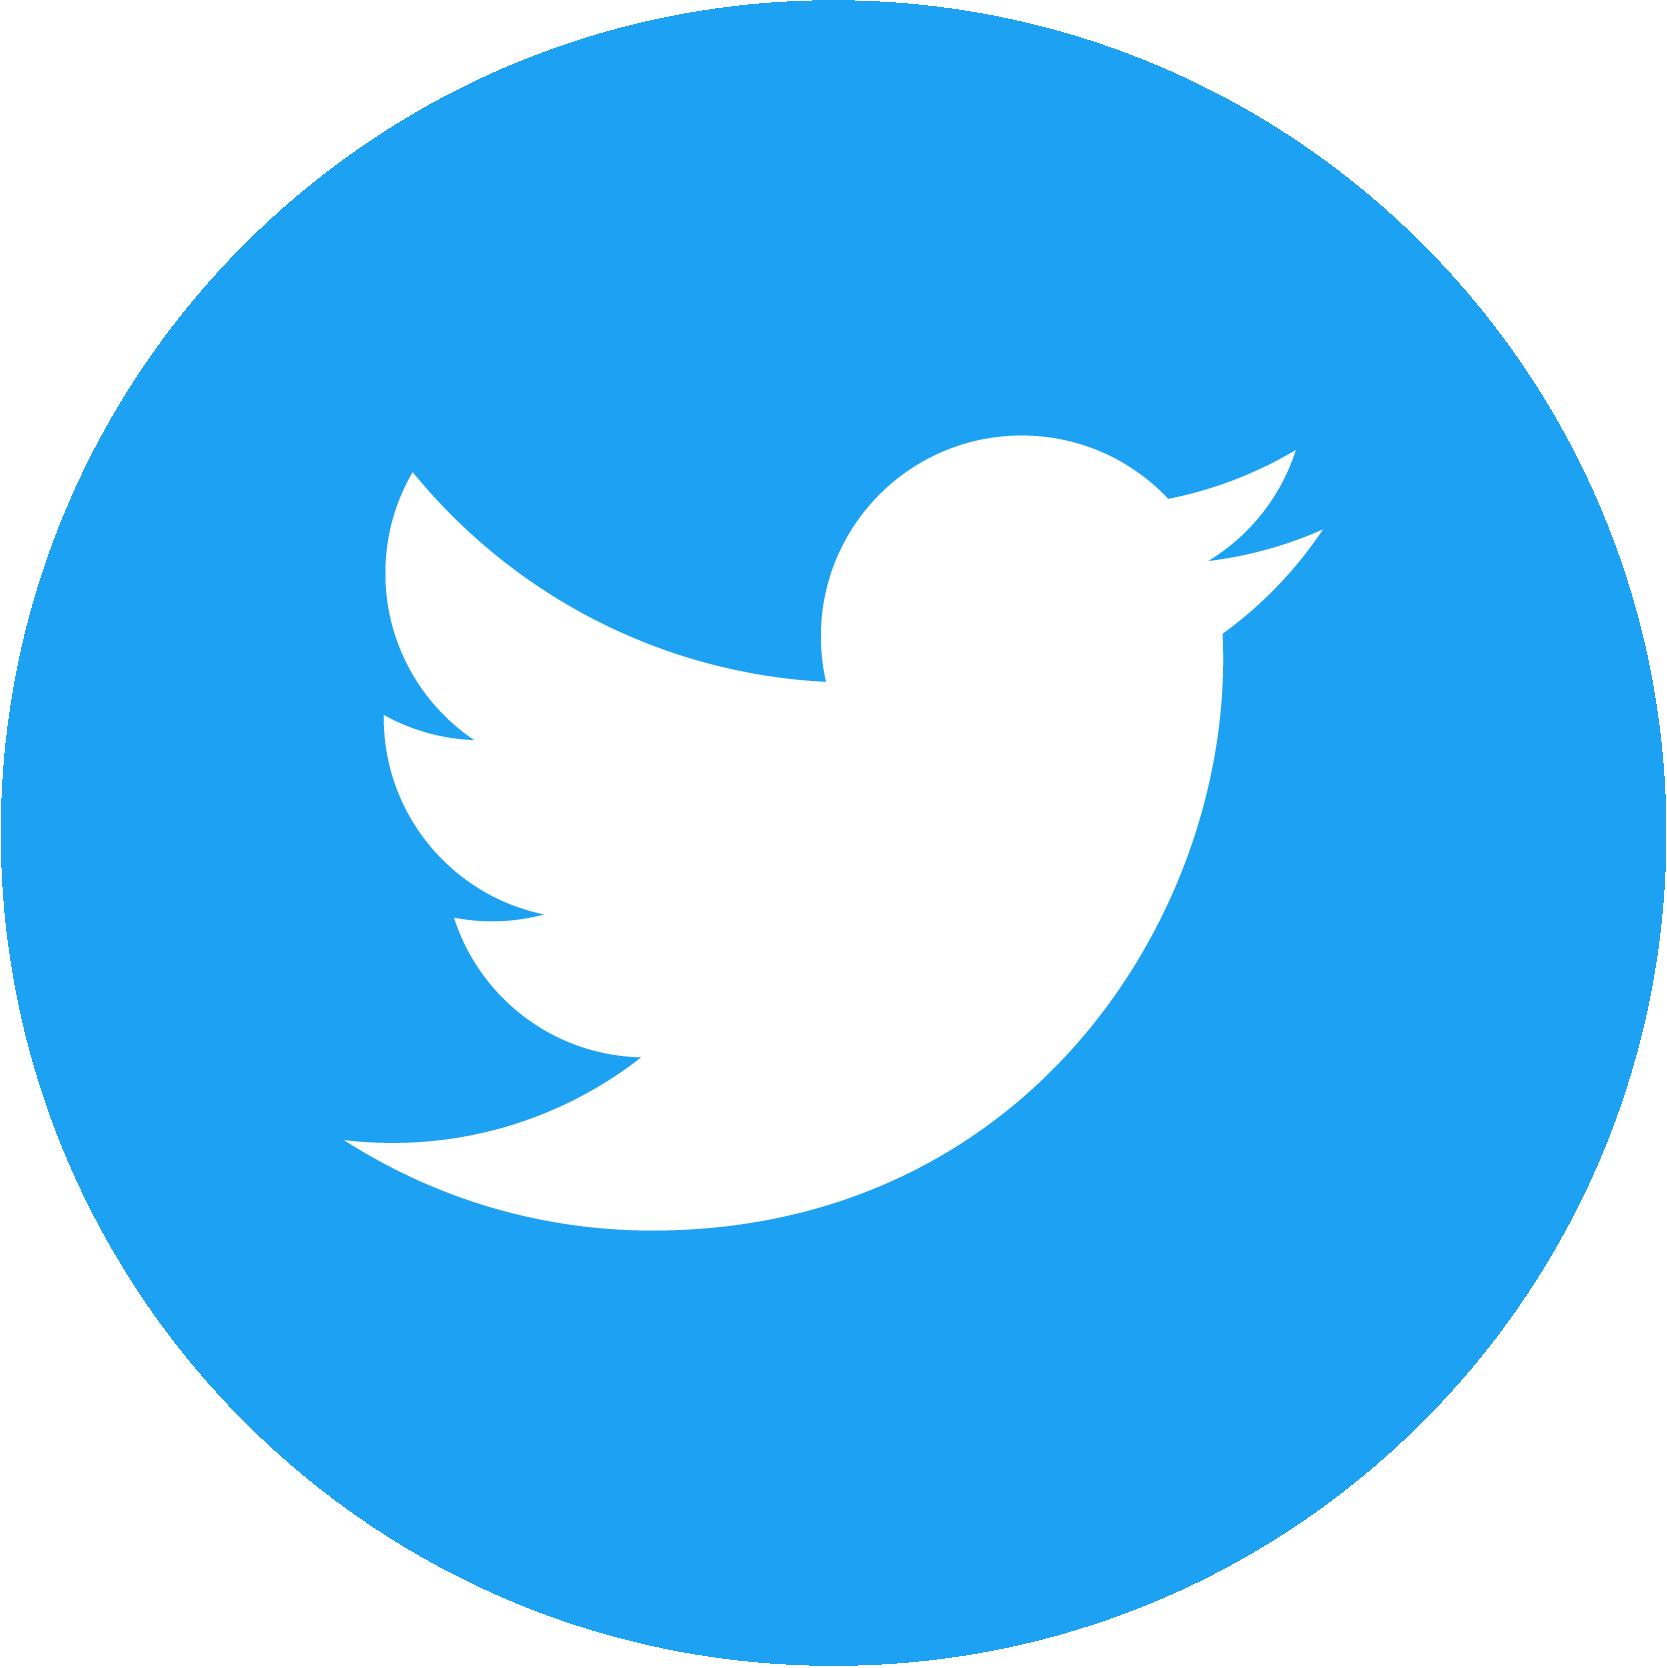 Find us on Twitter